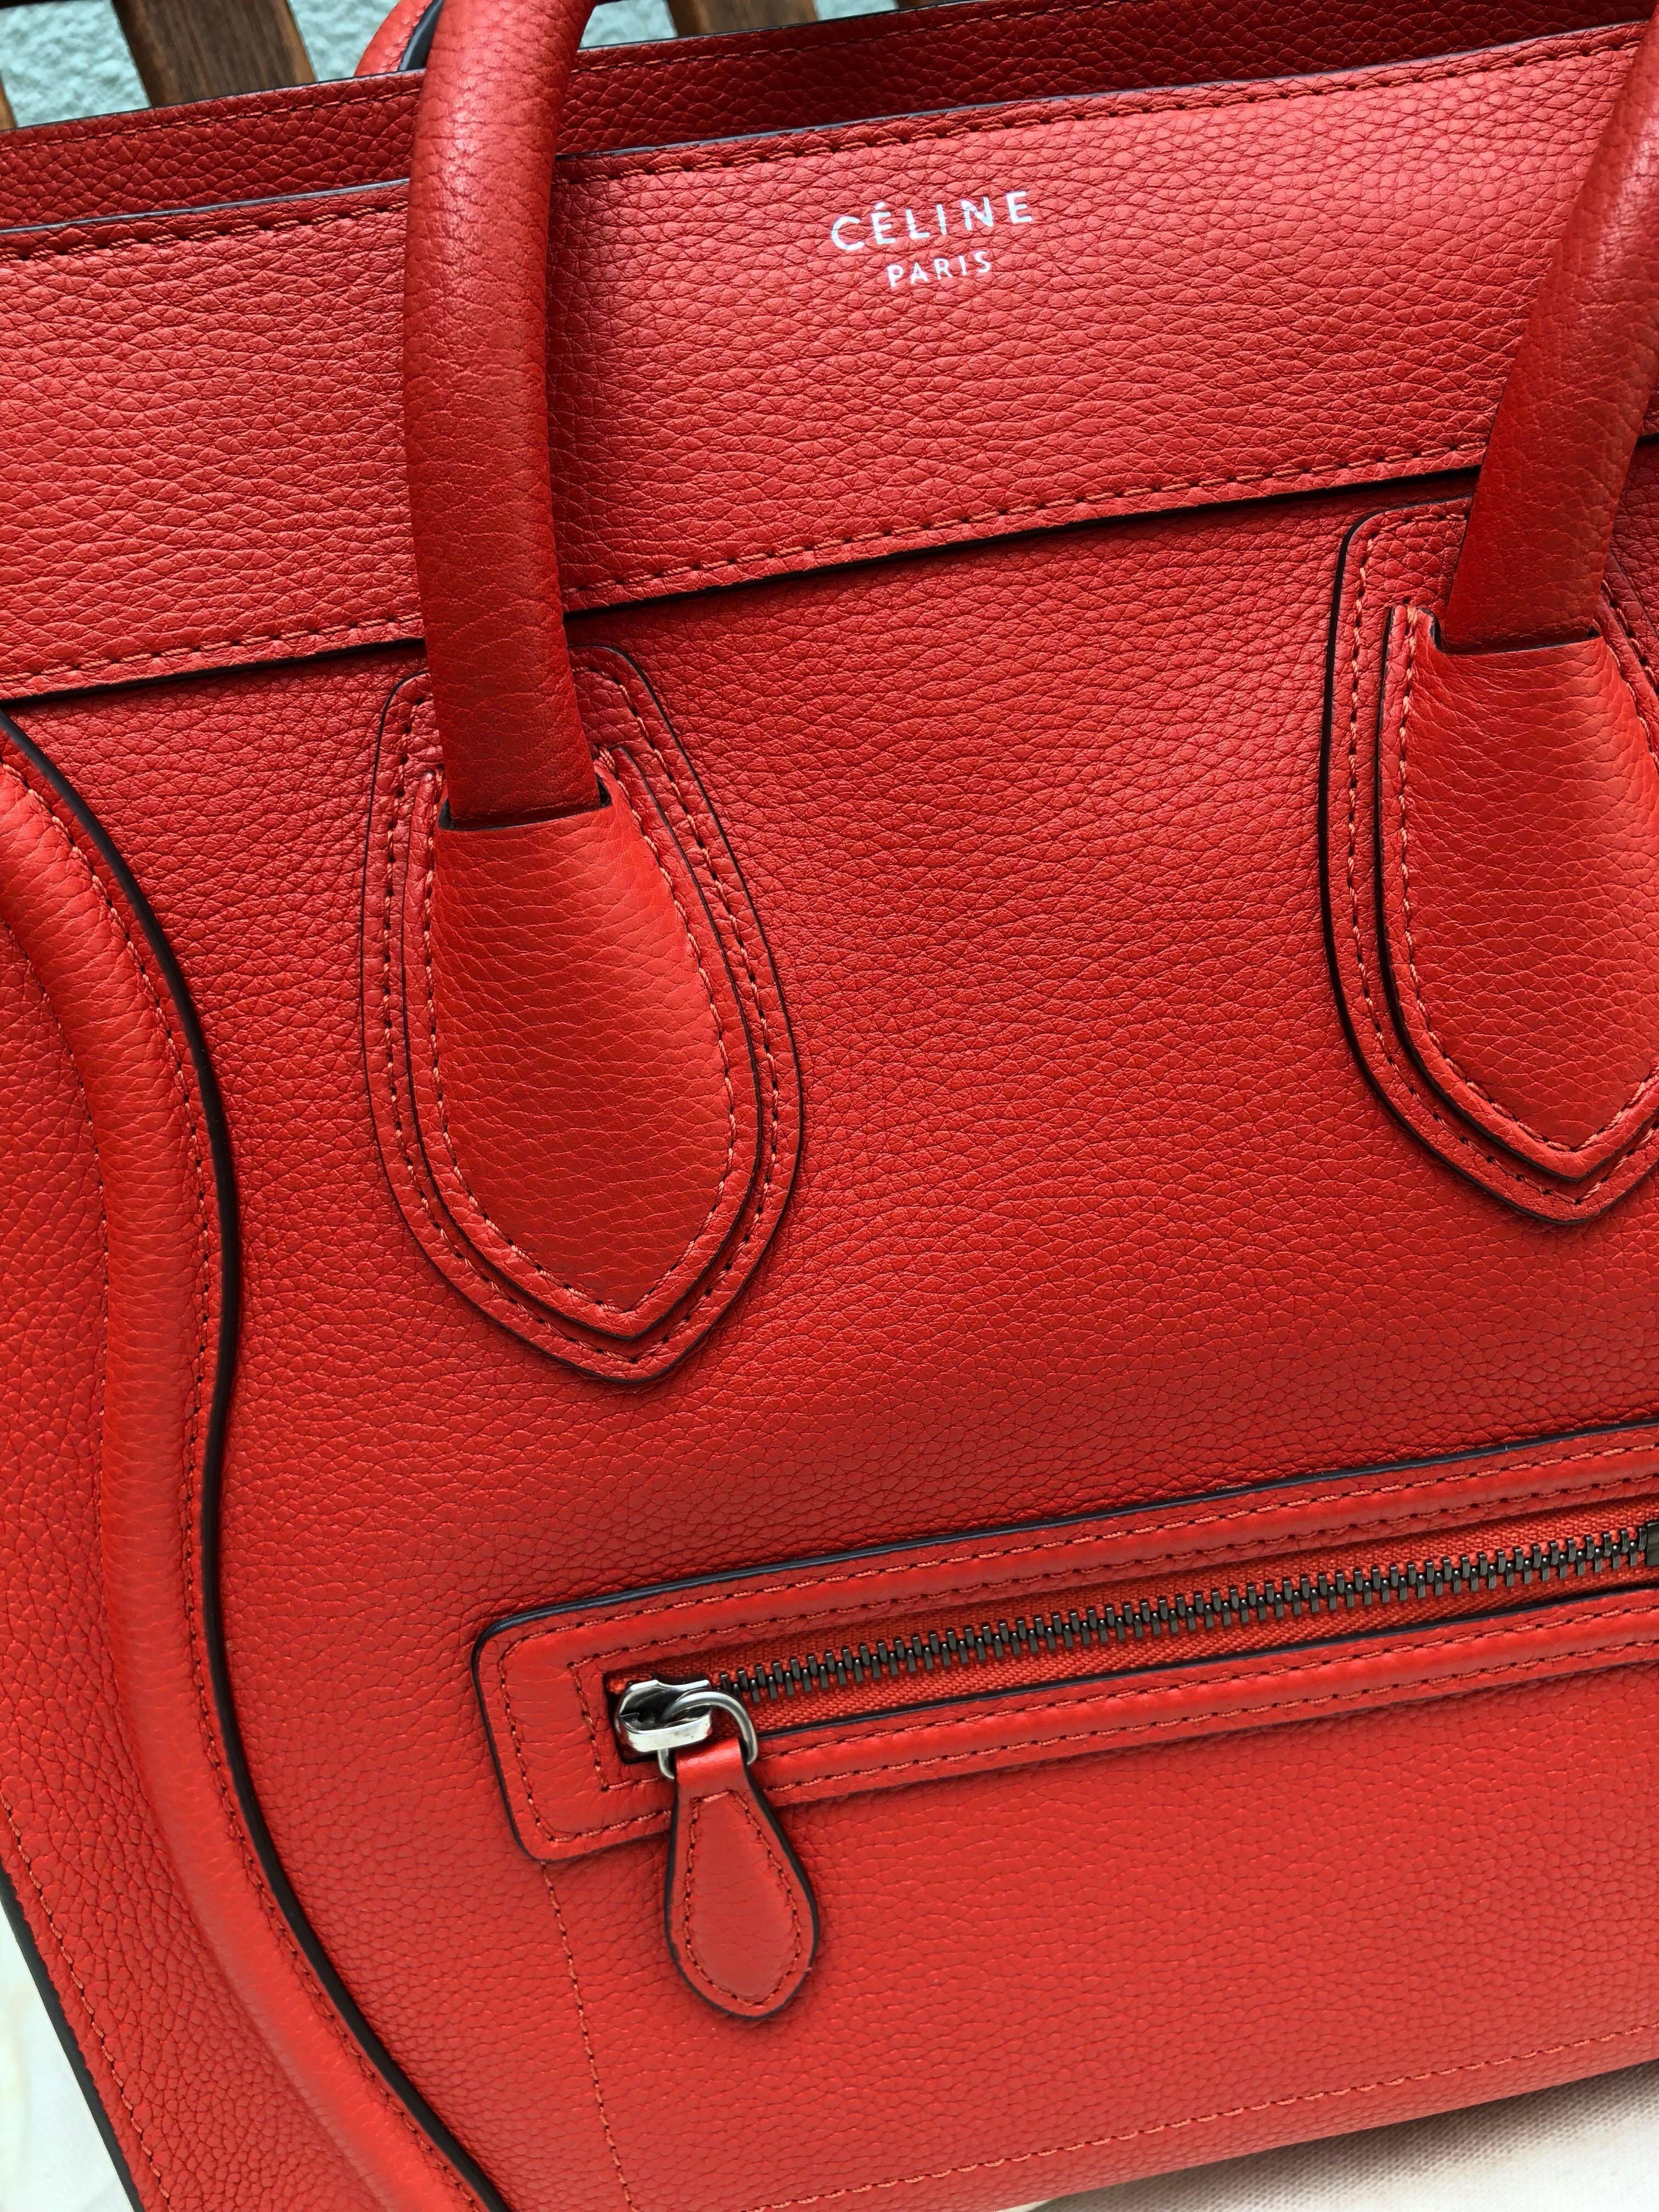 Céline Mini Luggage in Vermillion ecf8ee4462e67